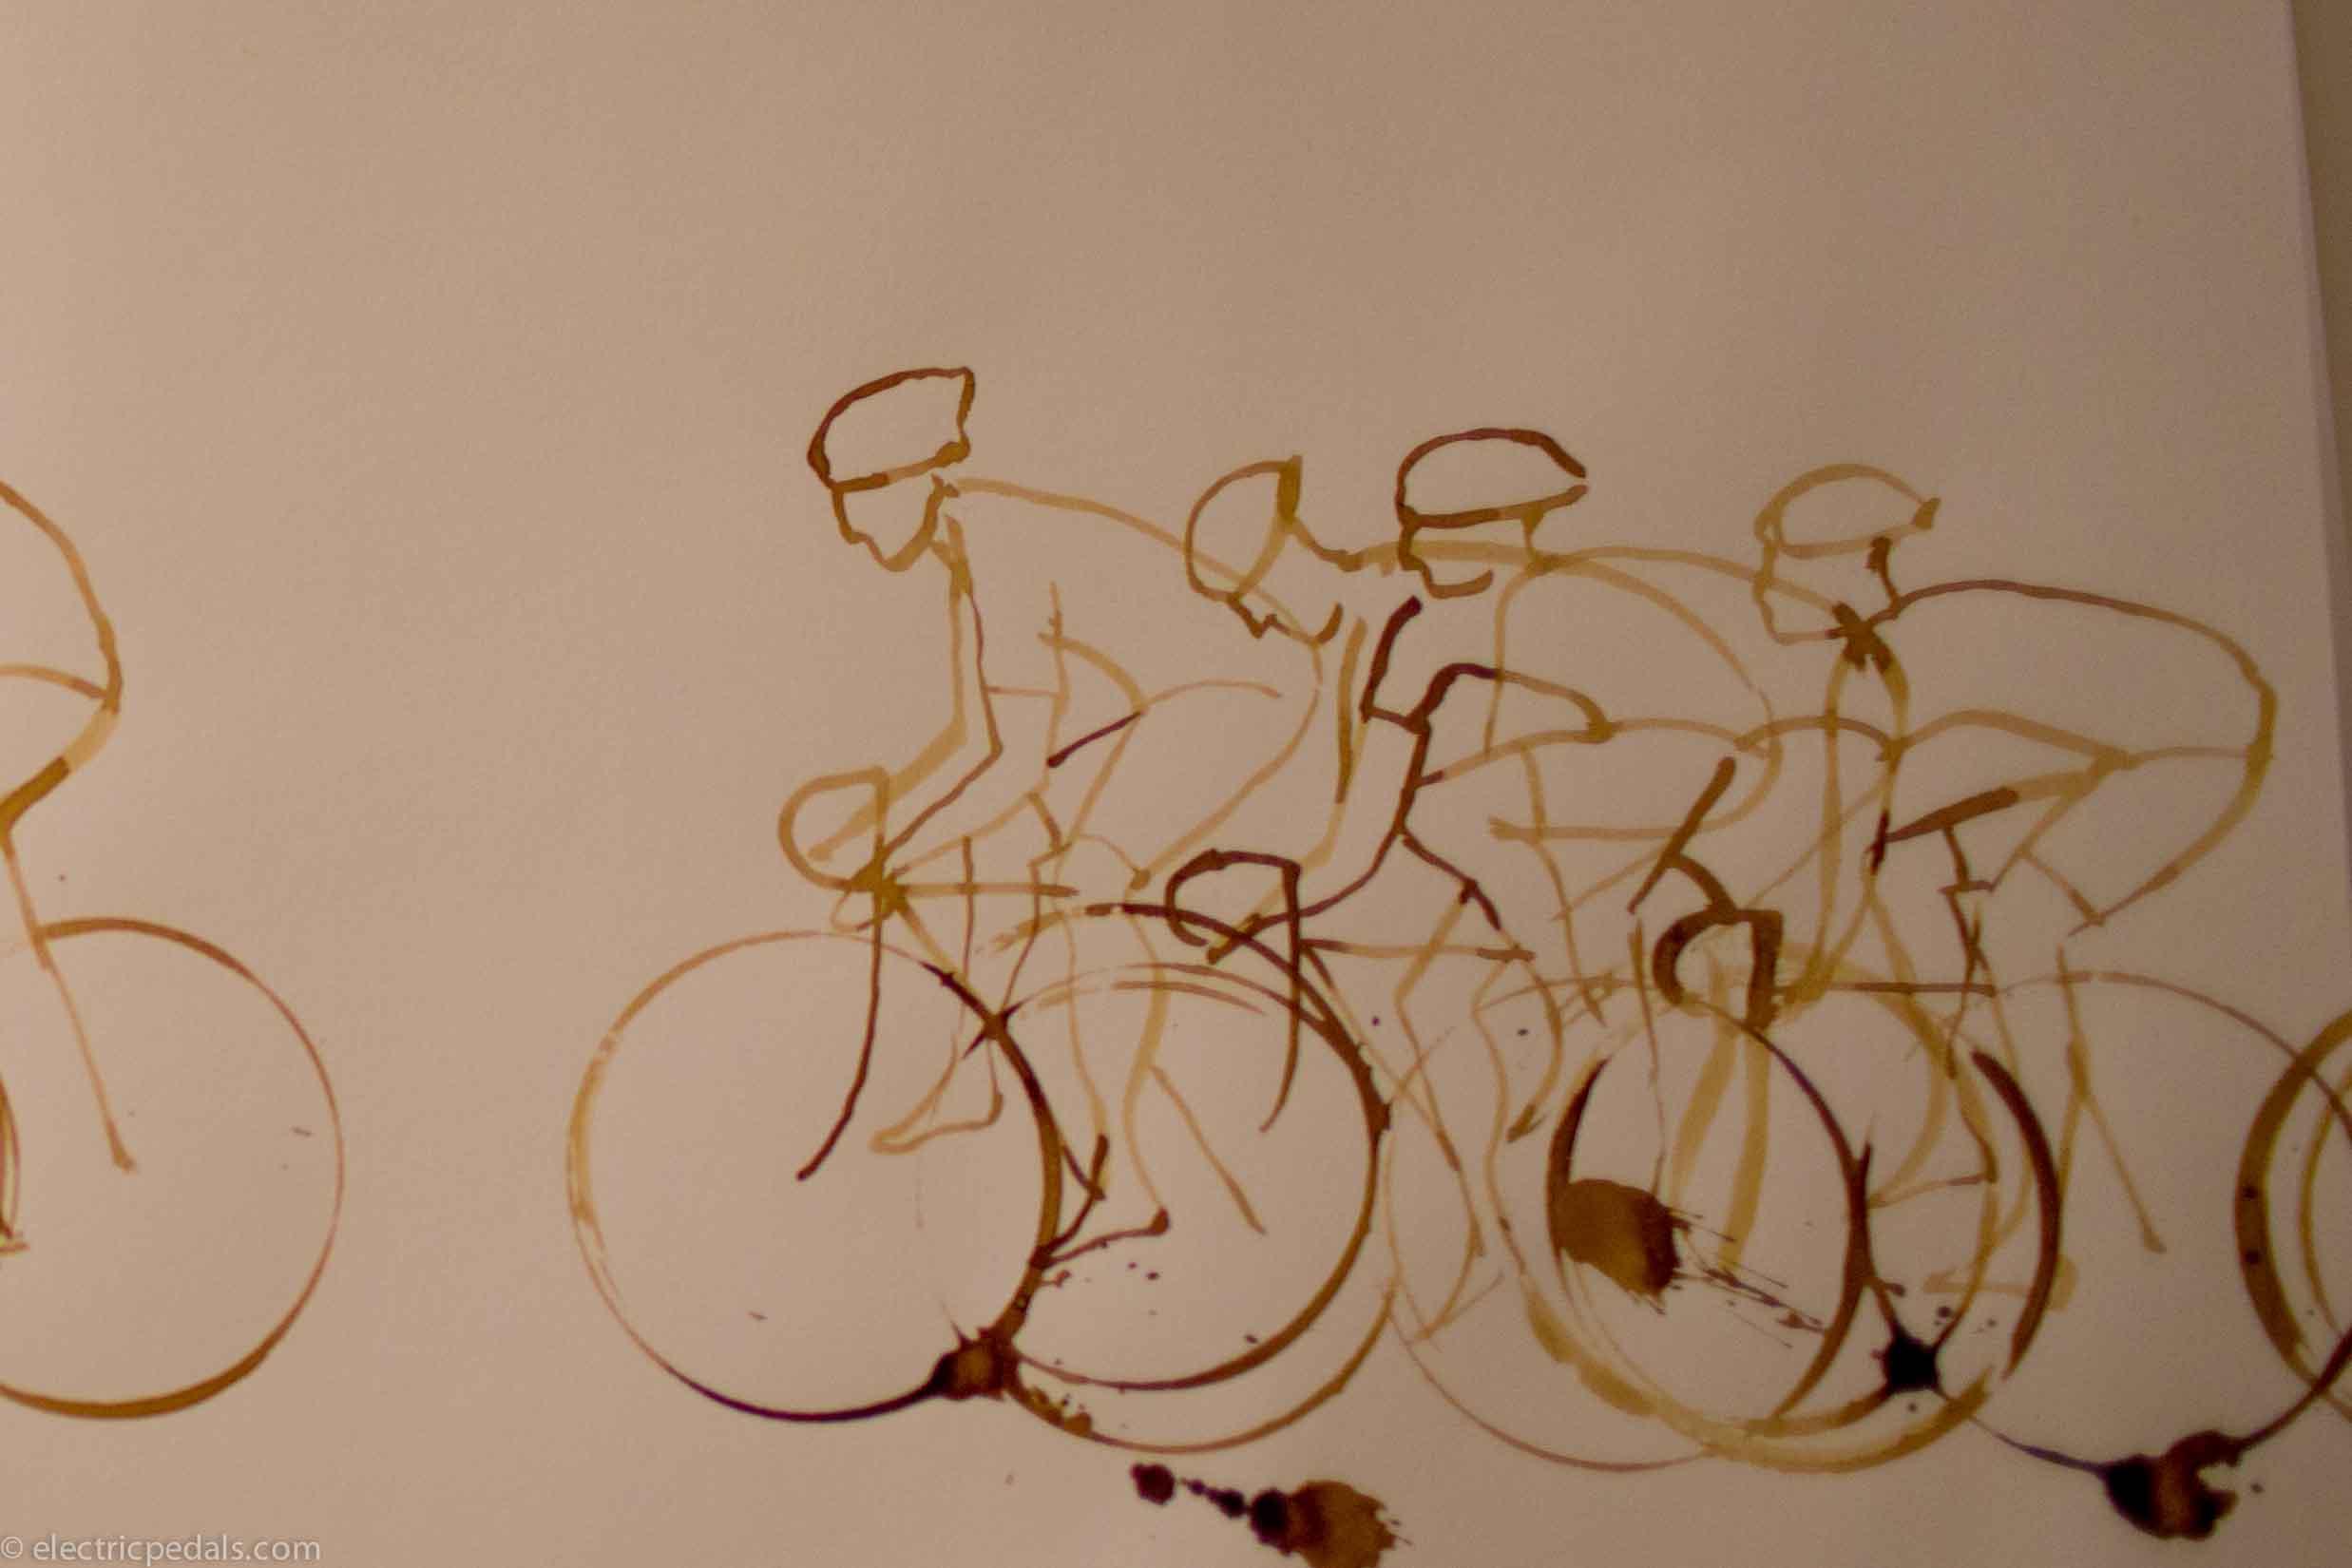 draw of coffee cup road bike